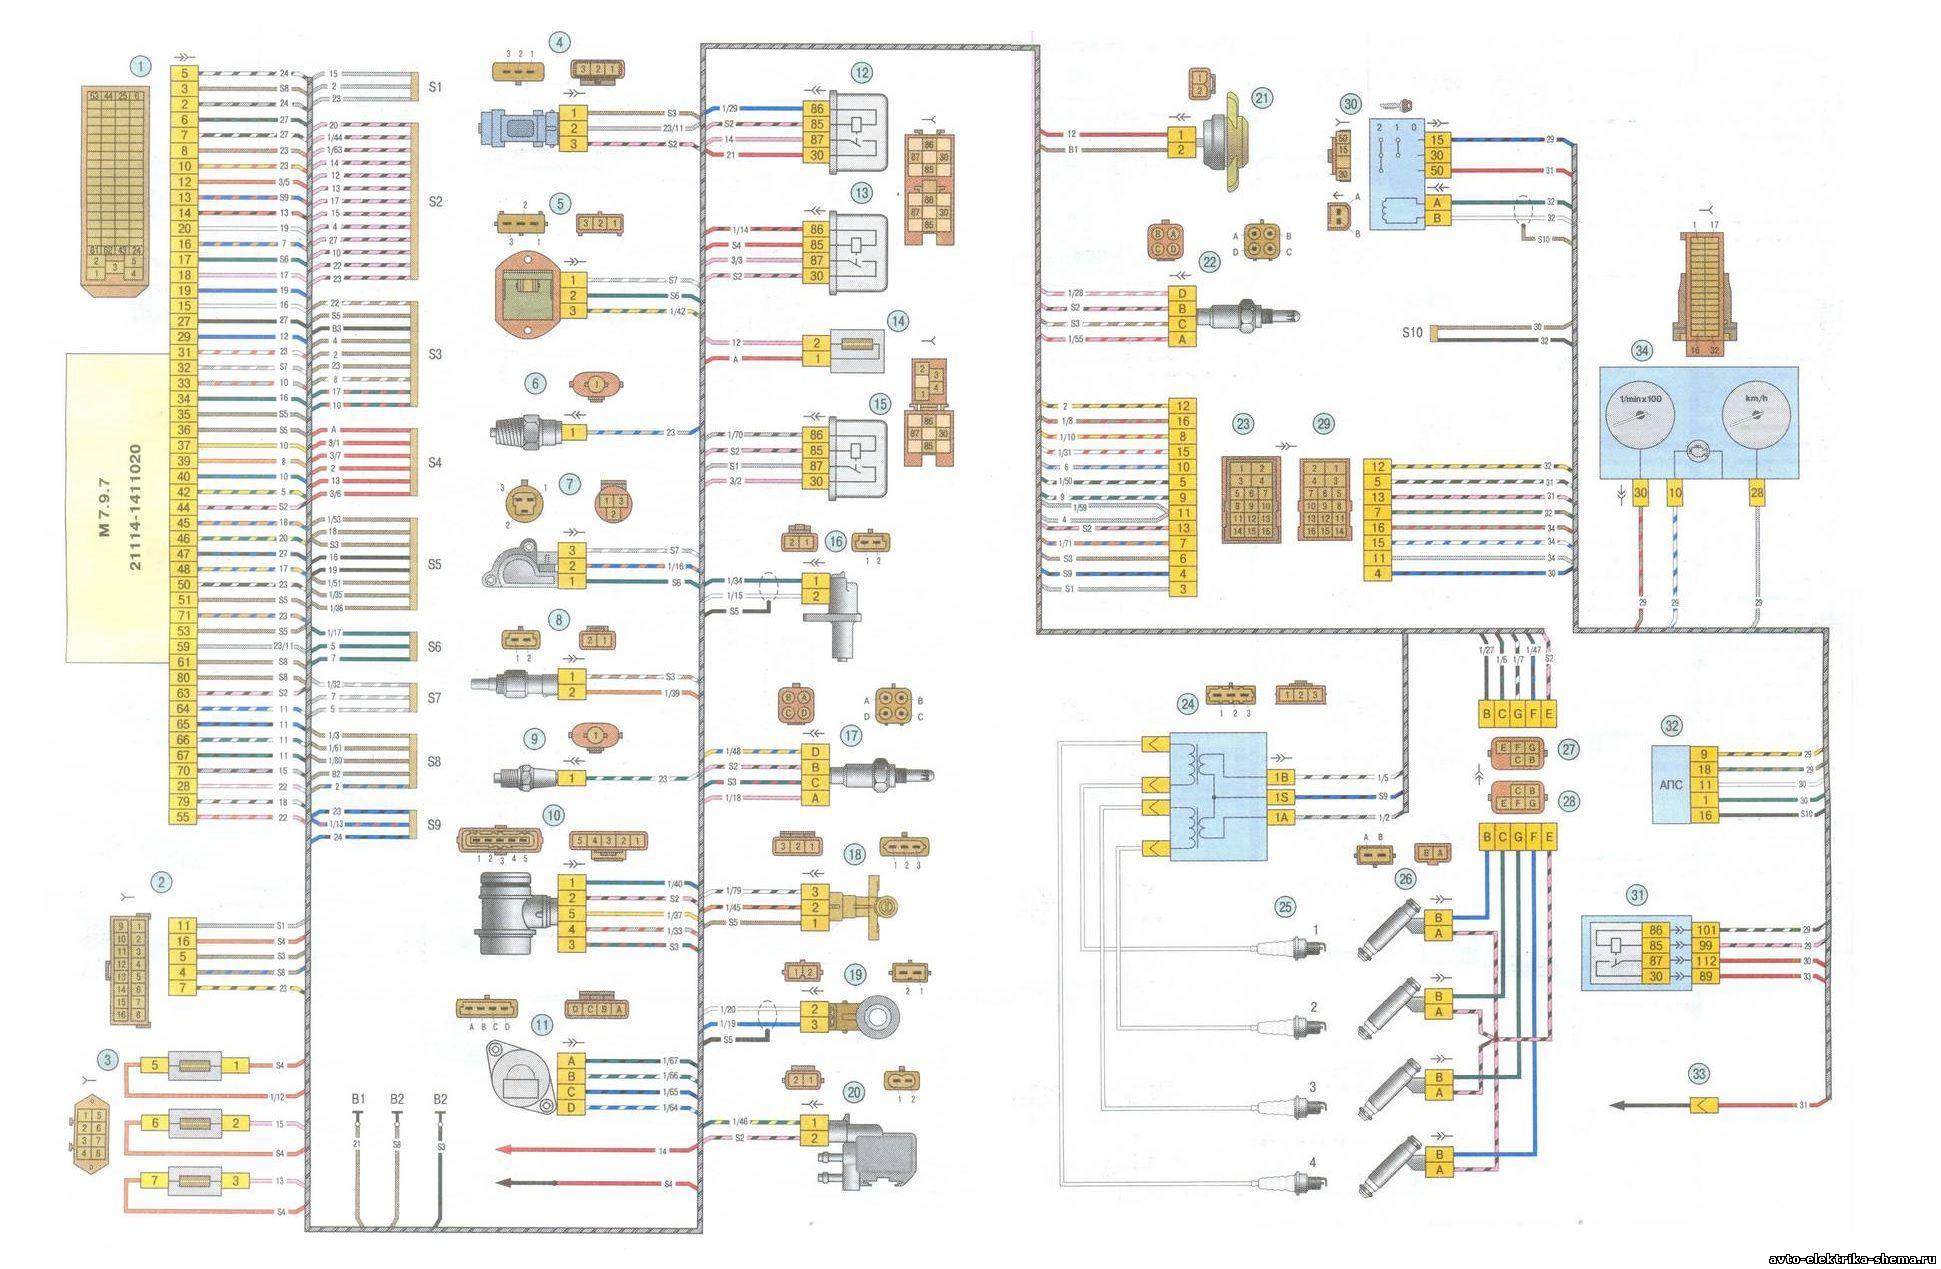 Схема электрооборудования ВАЗ-1118 или Лада Калина, Lada Kalina